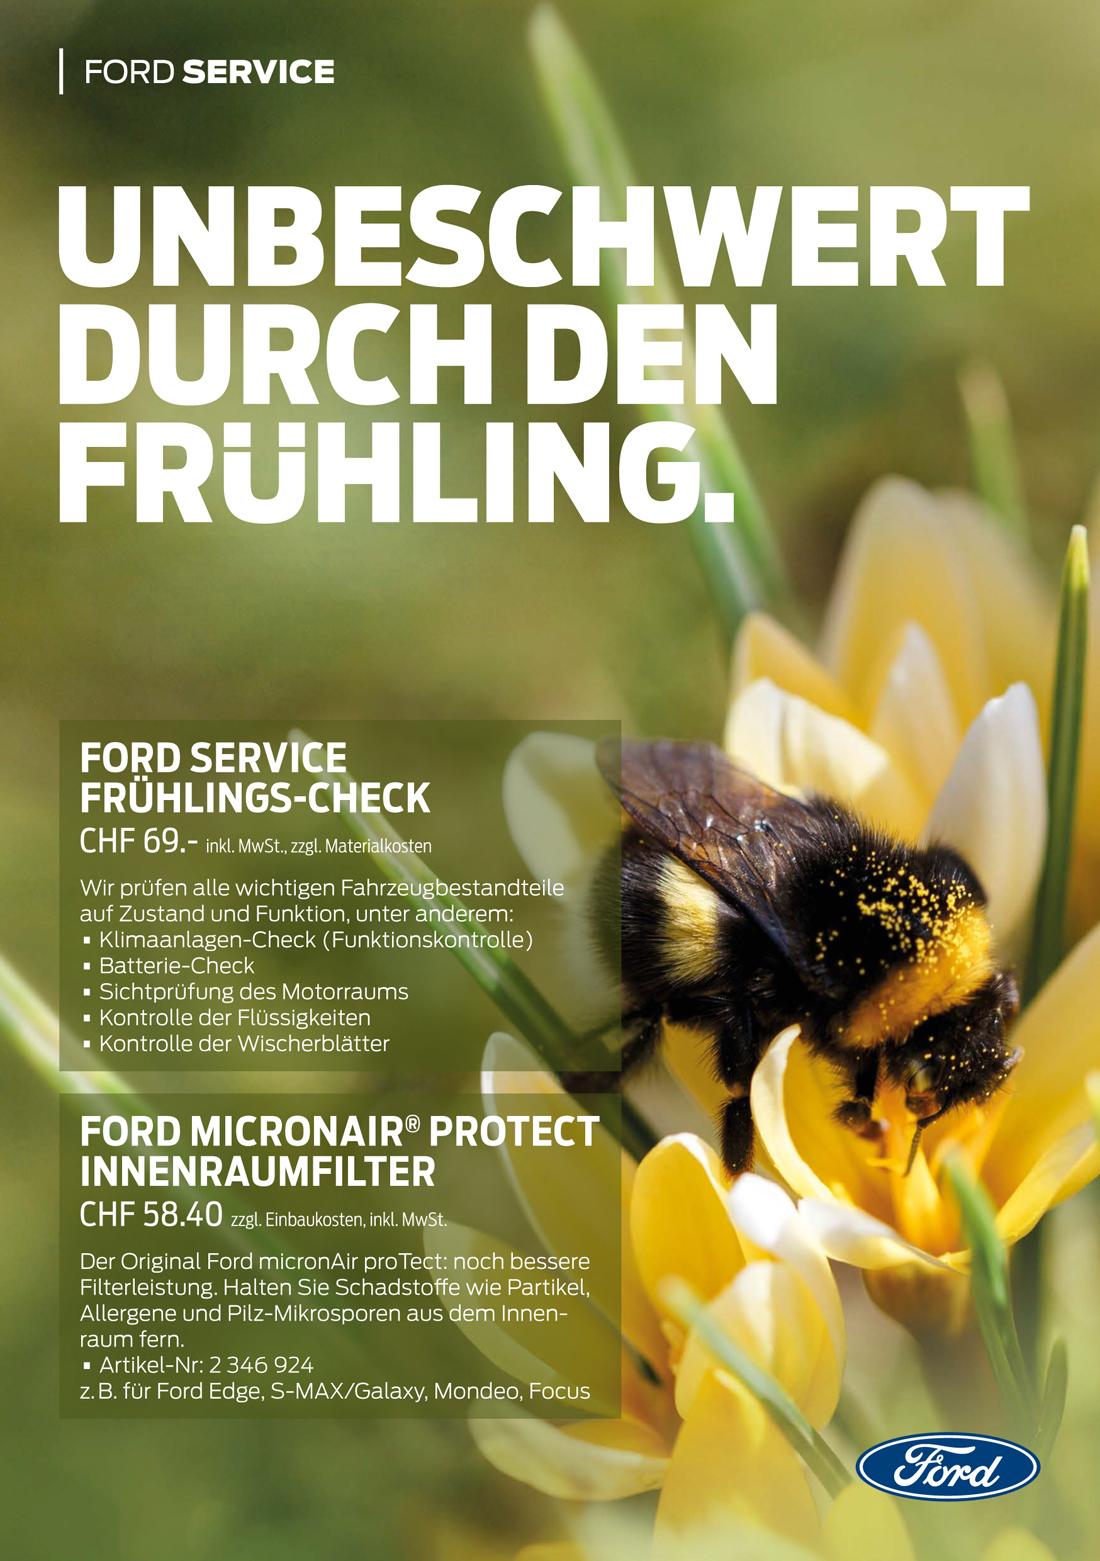 2021-Ford_Fruehlingskampagne_Broschuere-Seite-1a-2021-03-02-1.jpg#asset:717